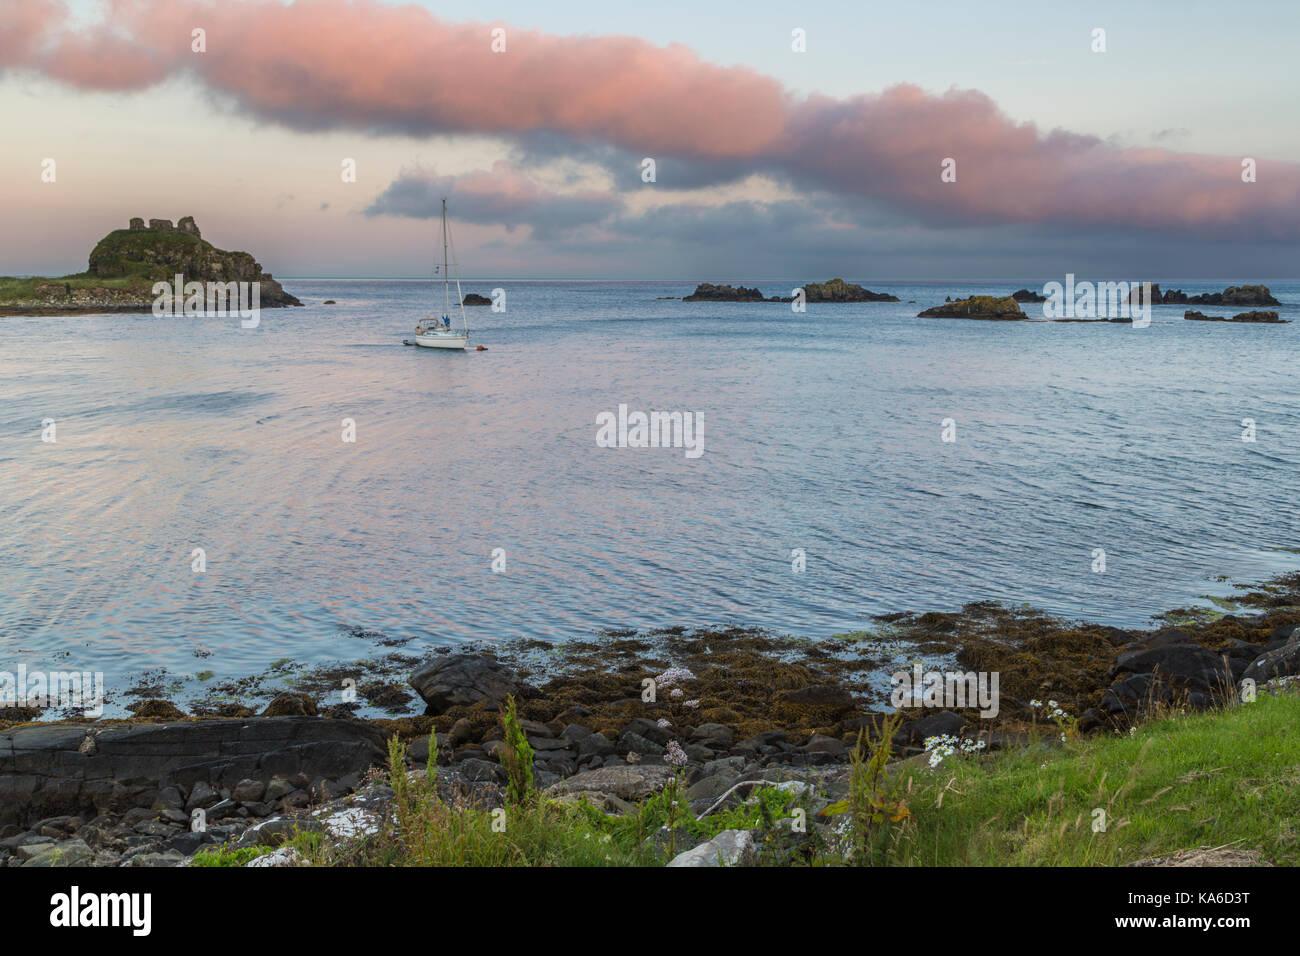 Sailing boat has droped anchor outside Islay, Scotland - Stock Image